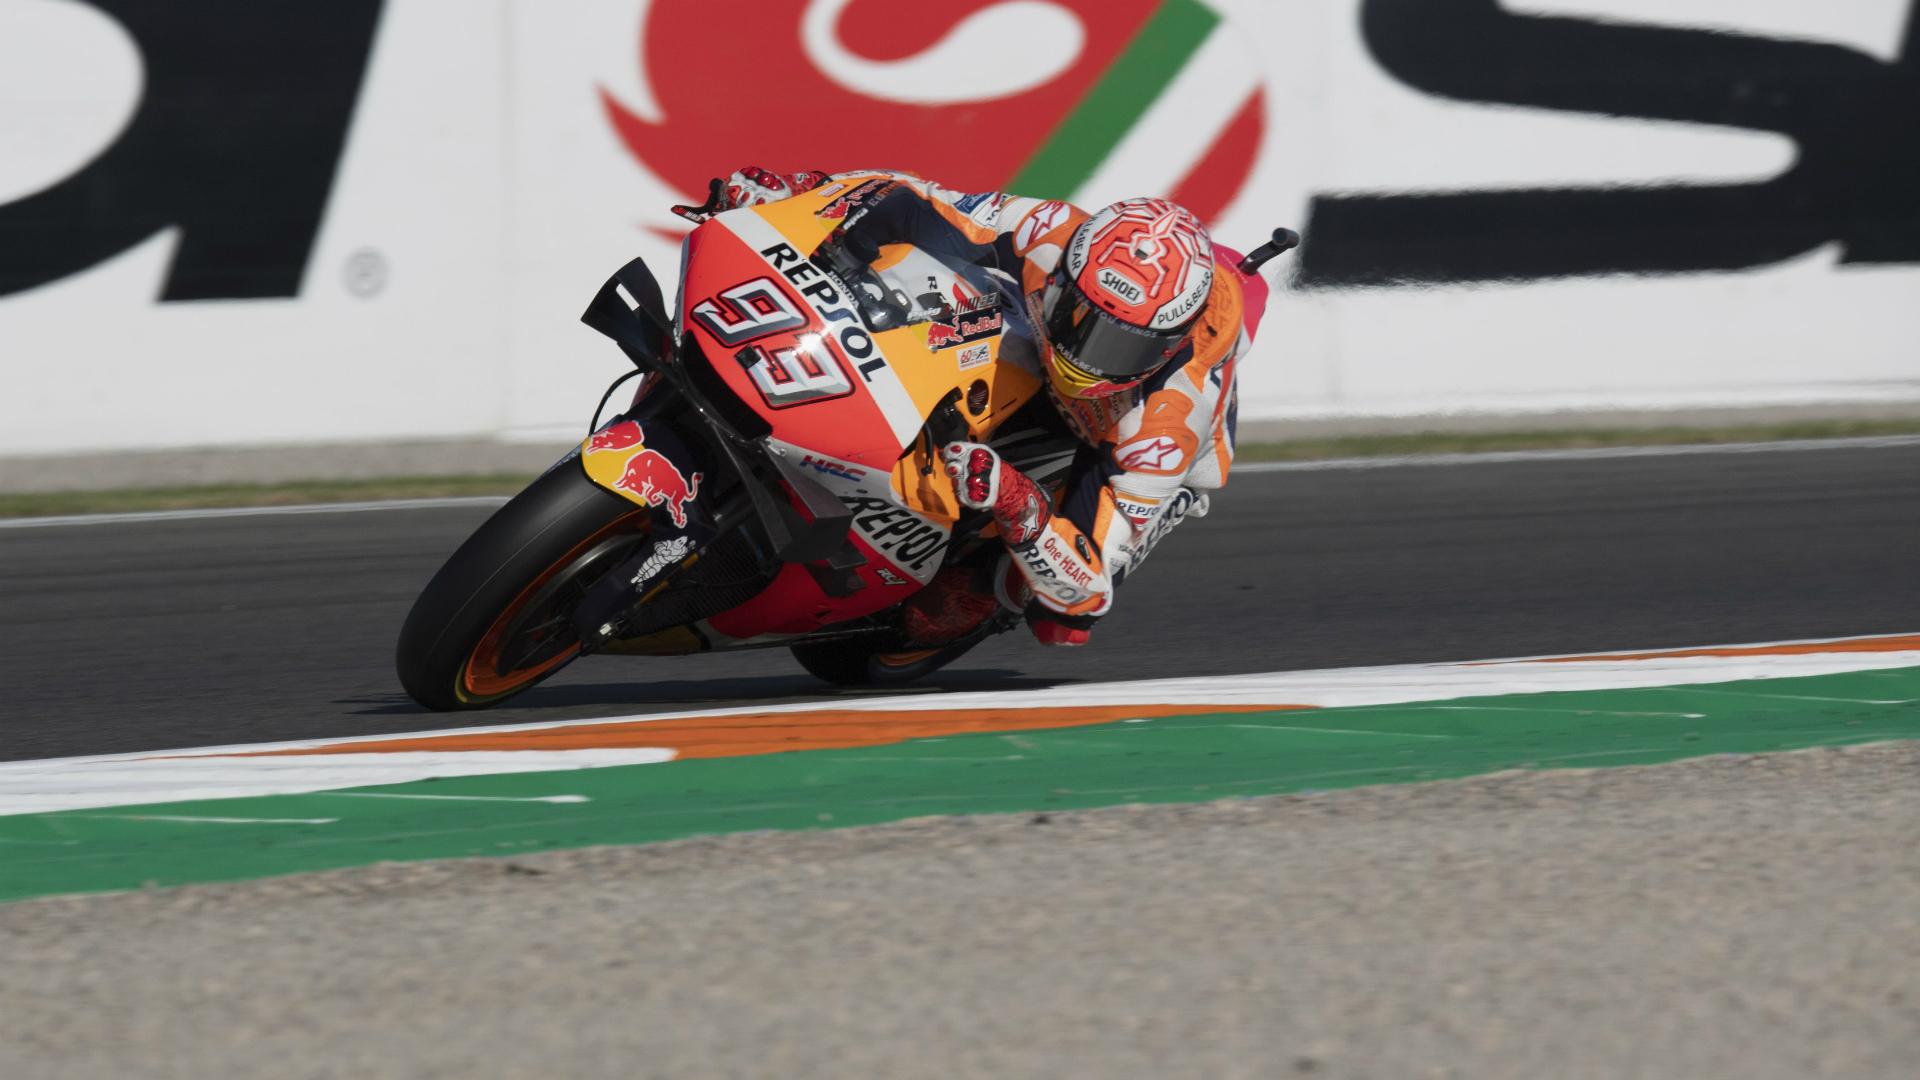 MotoGP Raceweek: Marvellous Marquez secures team title for Repsol Honda as Lorenzo bids farewell